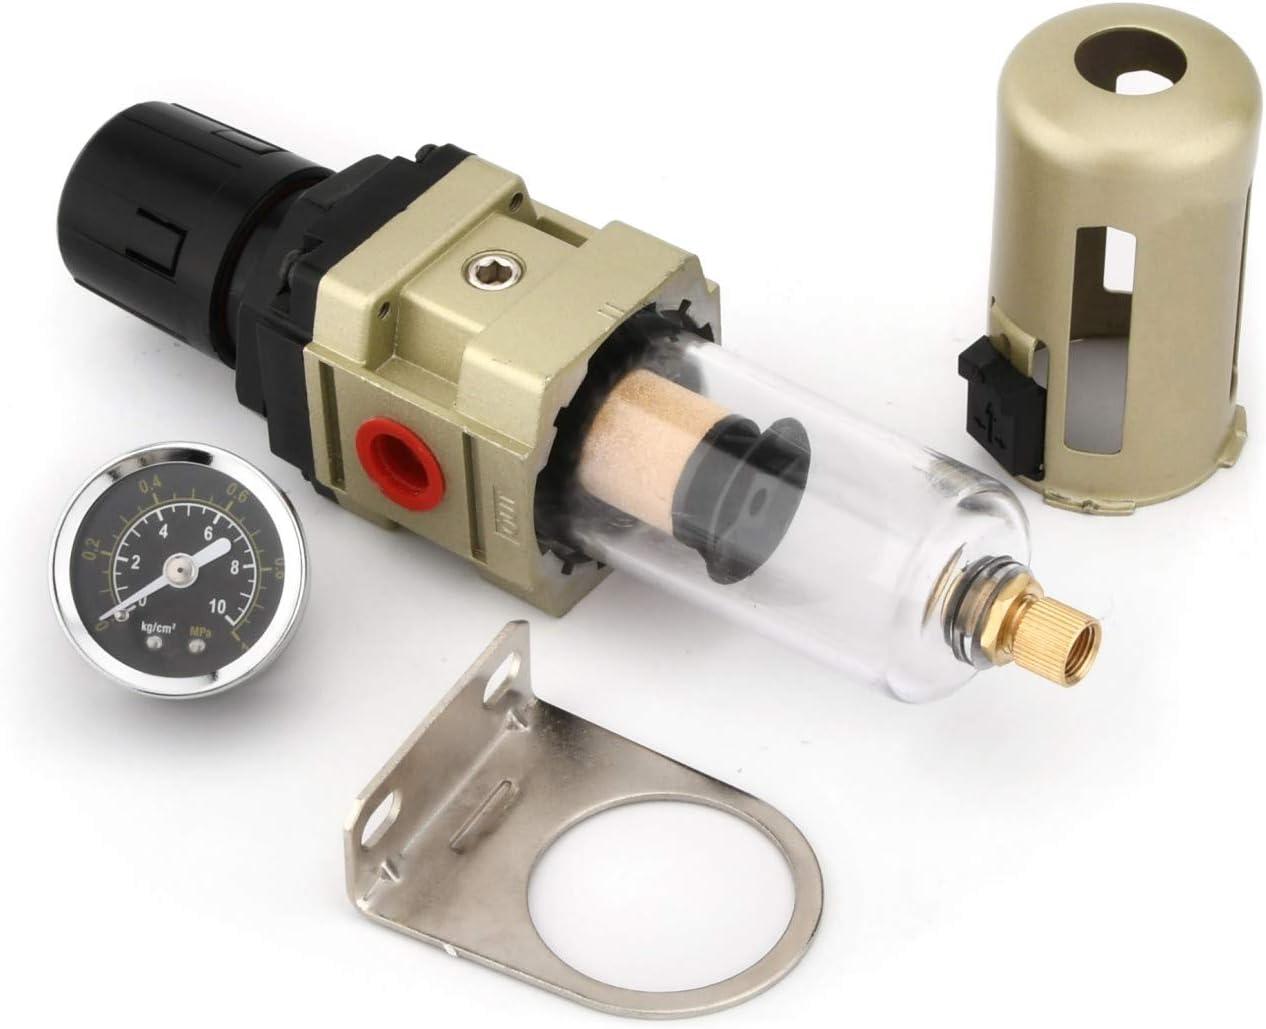 con pantalla met/álica filtro de 3//8 de pulgada Separador de agua Reductor de presi/ón Regulador de aire comprimido para compresor de aire comprimido